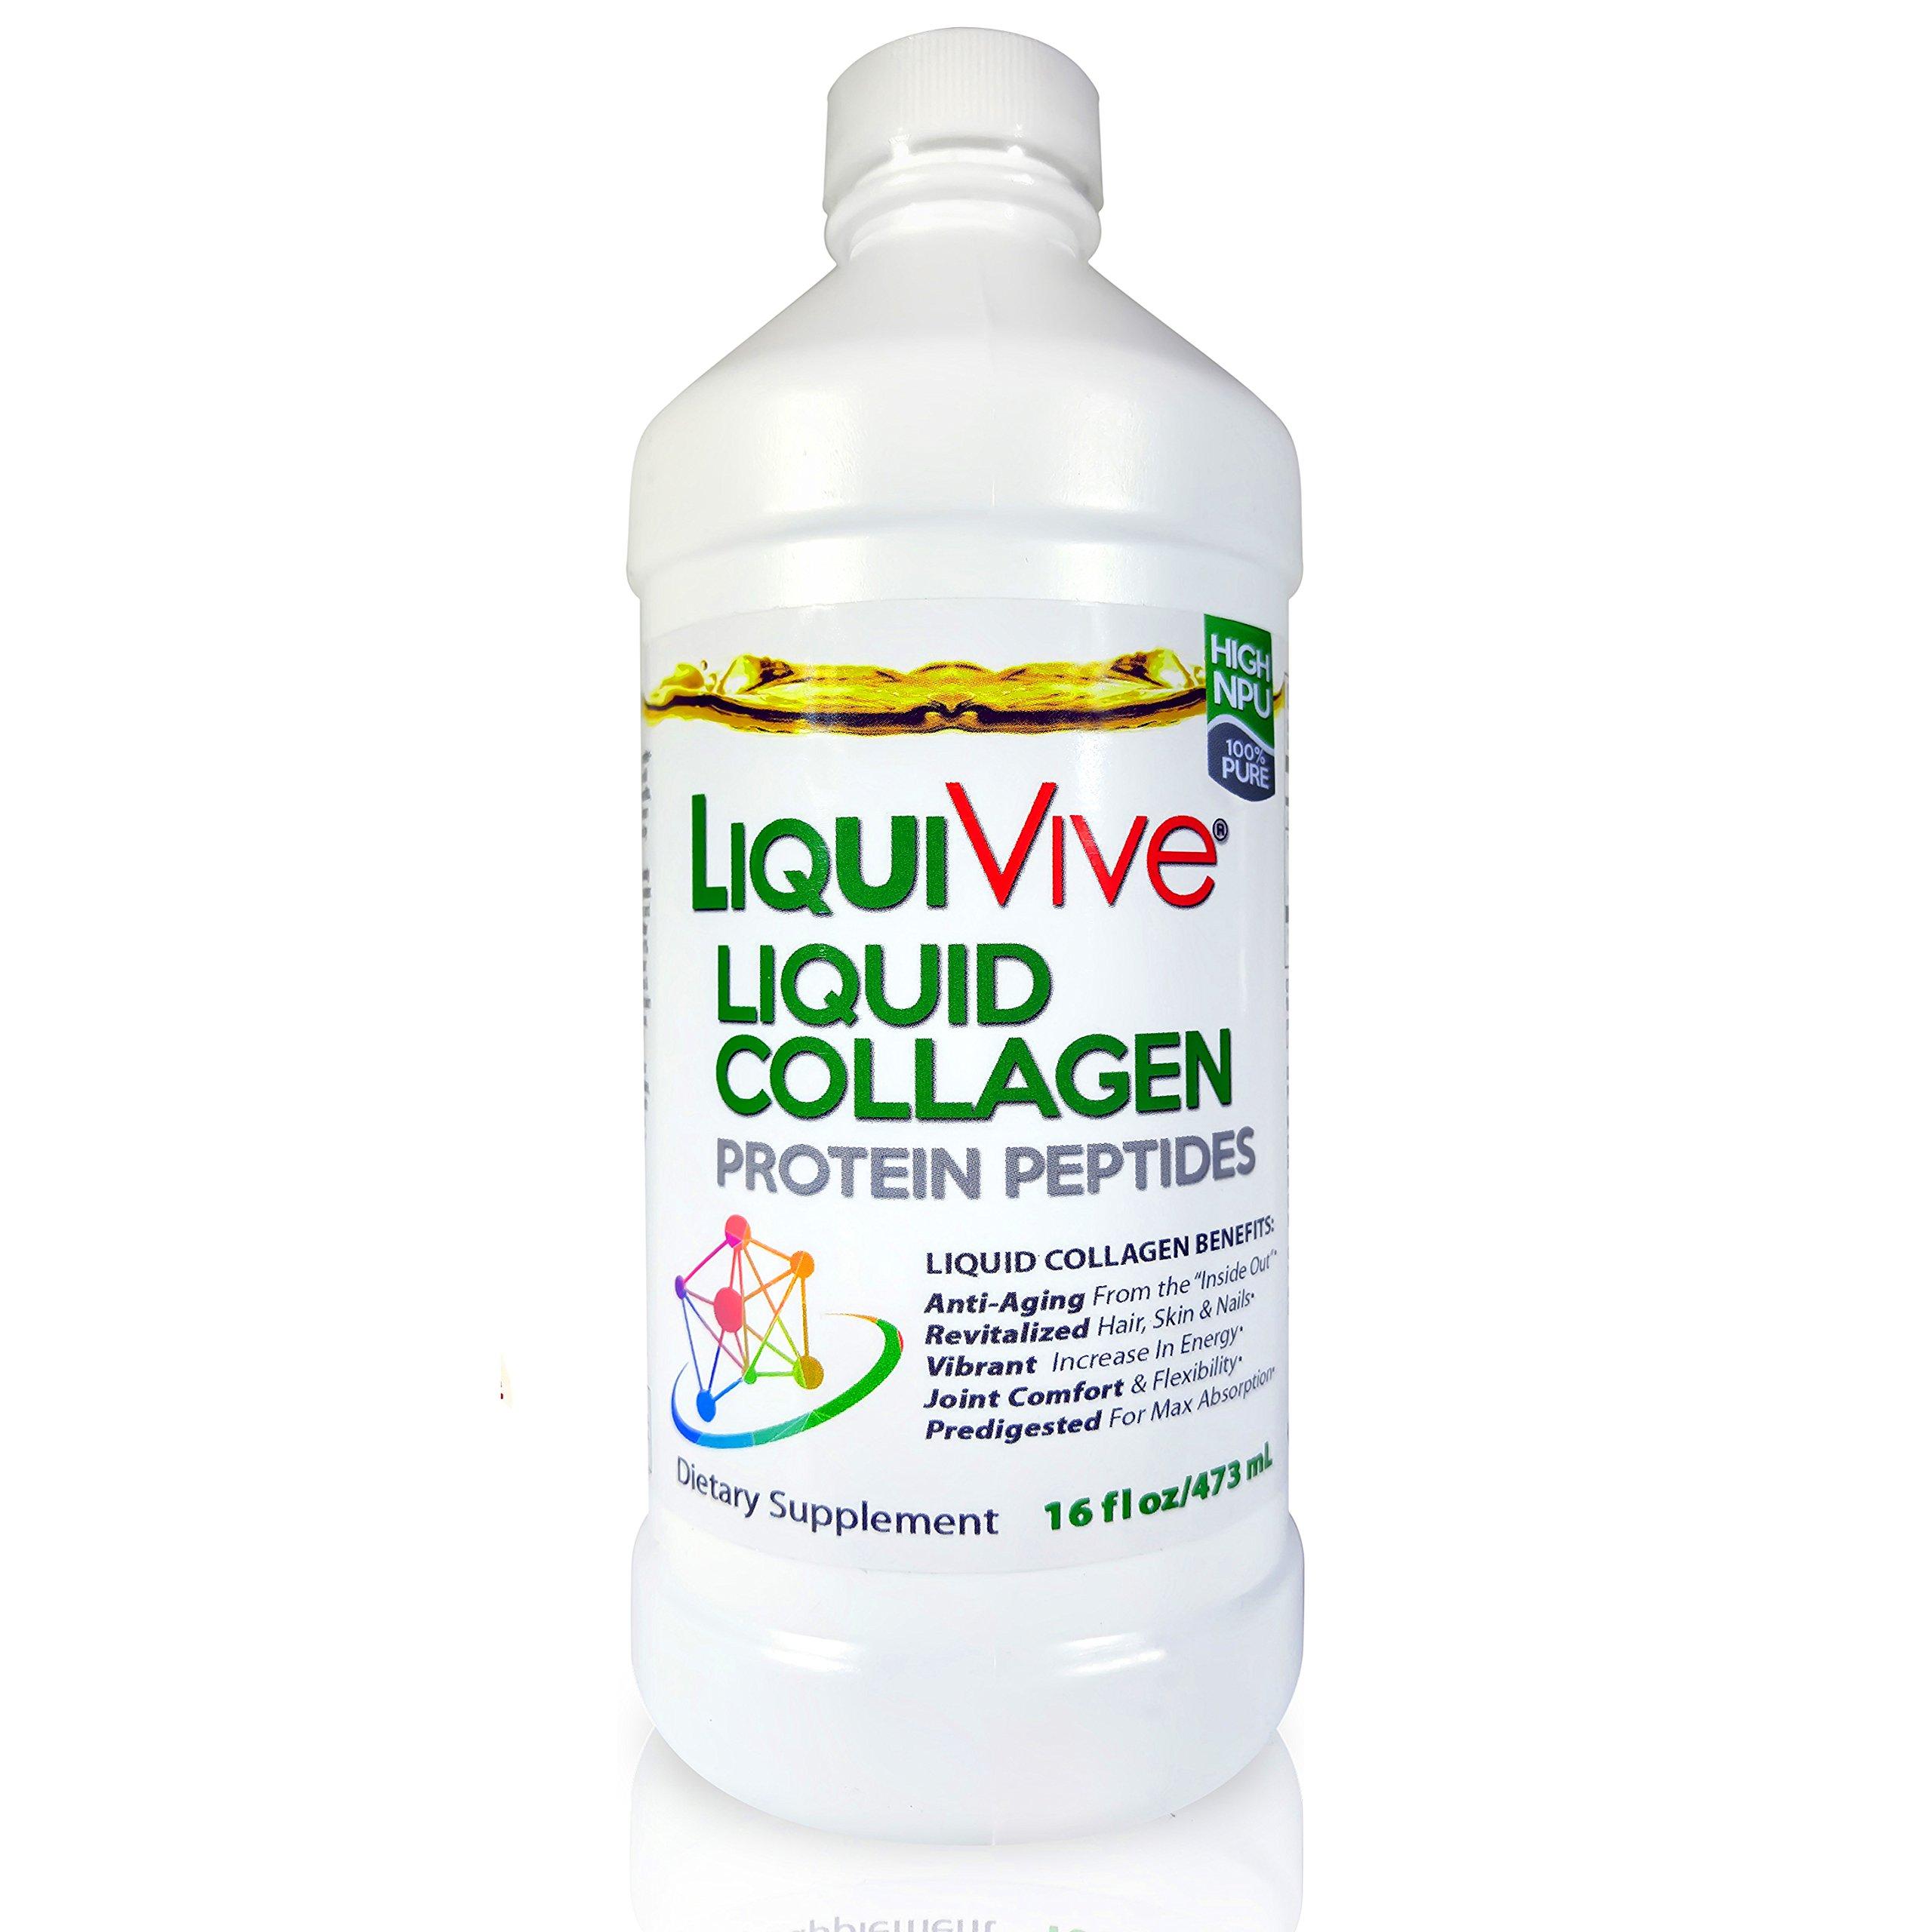 LiquiVive Liquid Collagen Protein Peptides | Pure Hydrolyzed Super Multi Collagen Hydrolysate Drink | Higher Absorption Than Collagen Powder Pills & Capsules | Colageno Liquido Hidrolizado